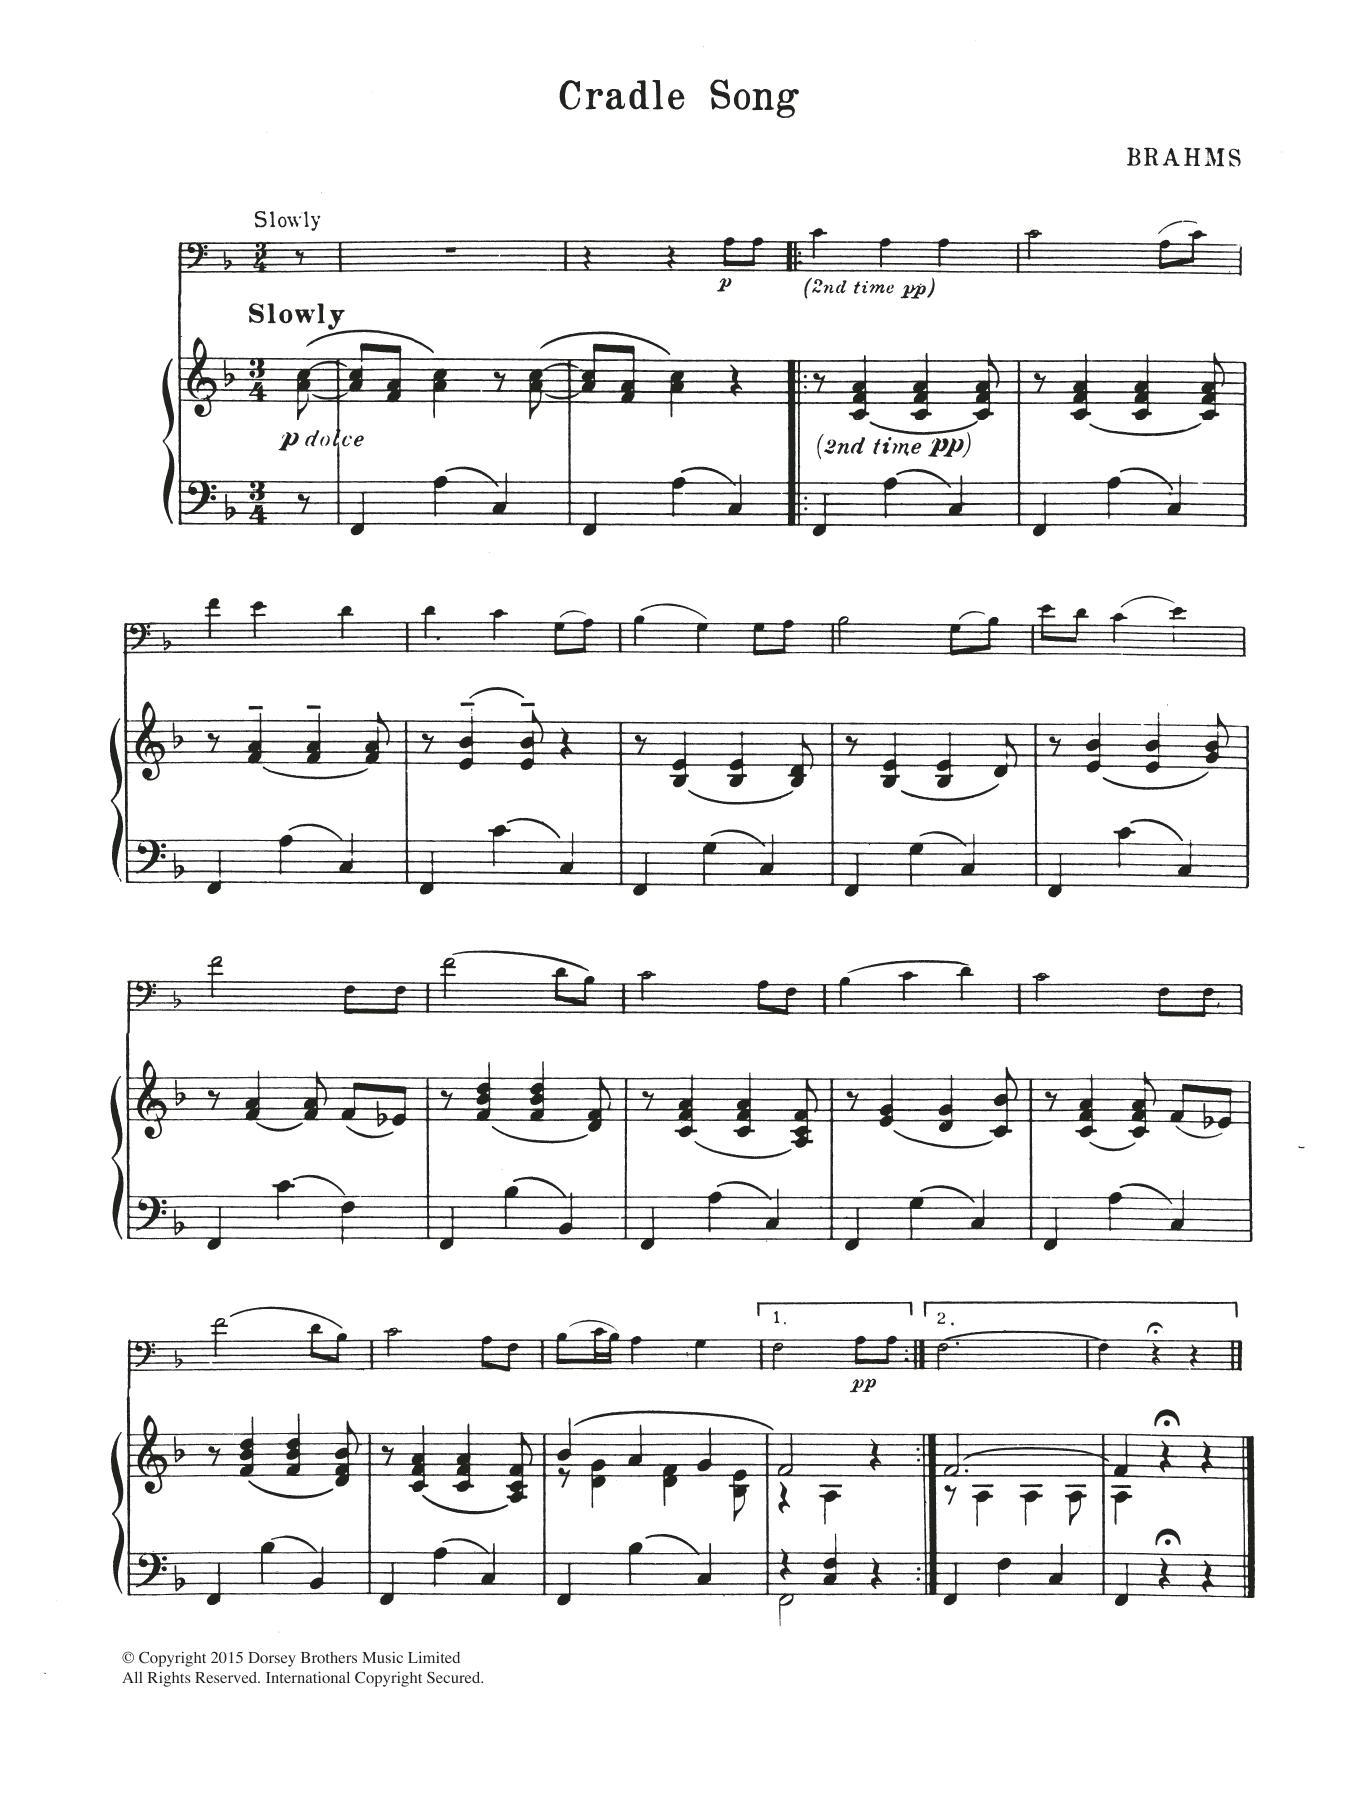 Johannes Brahms: Cradle Song